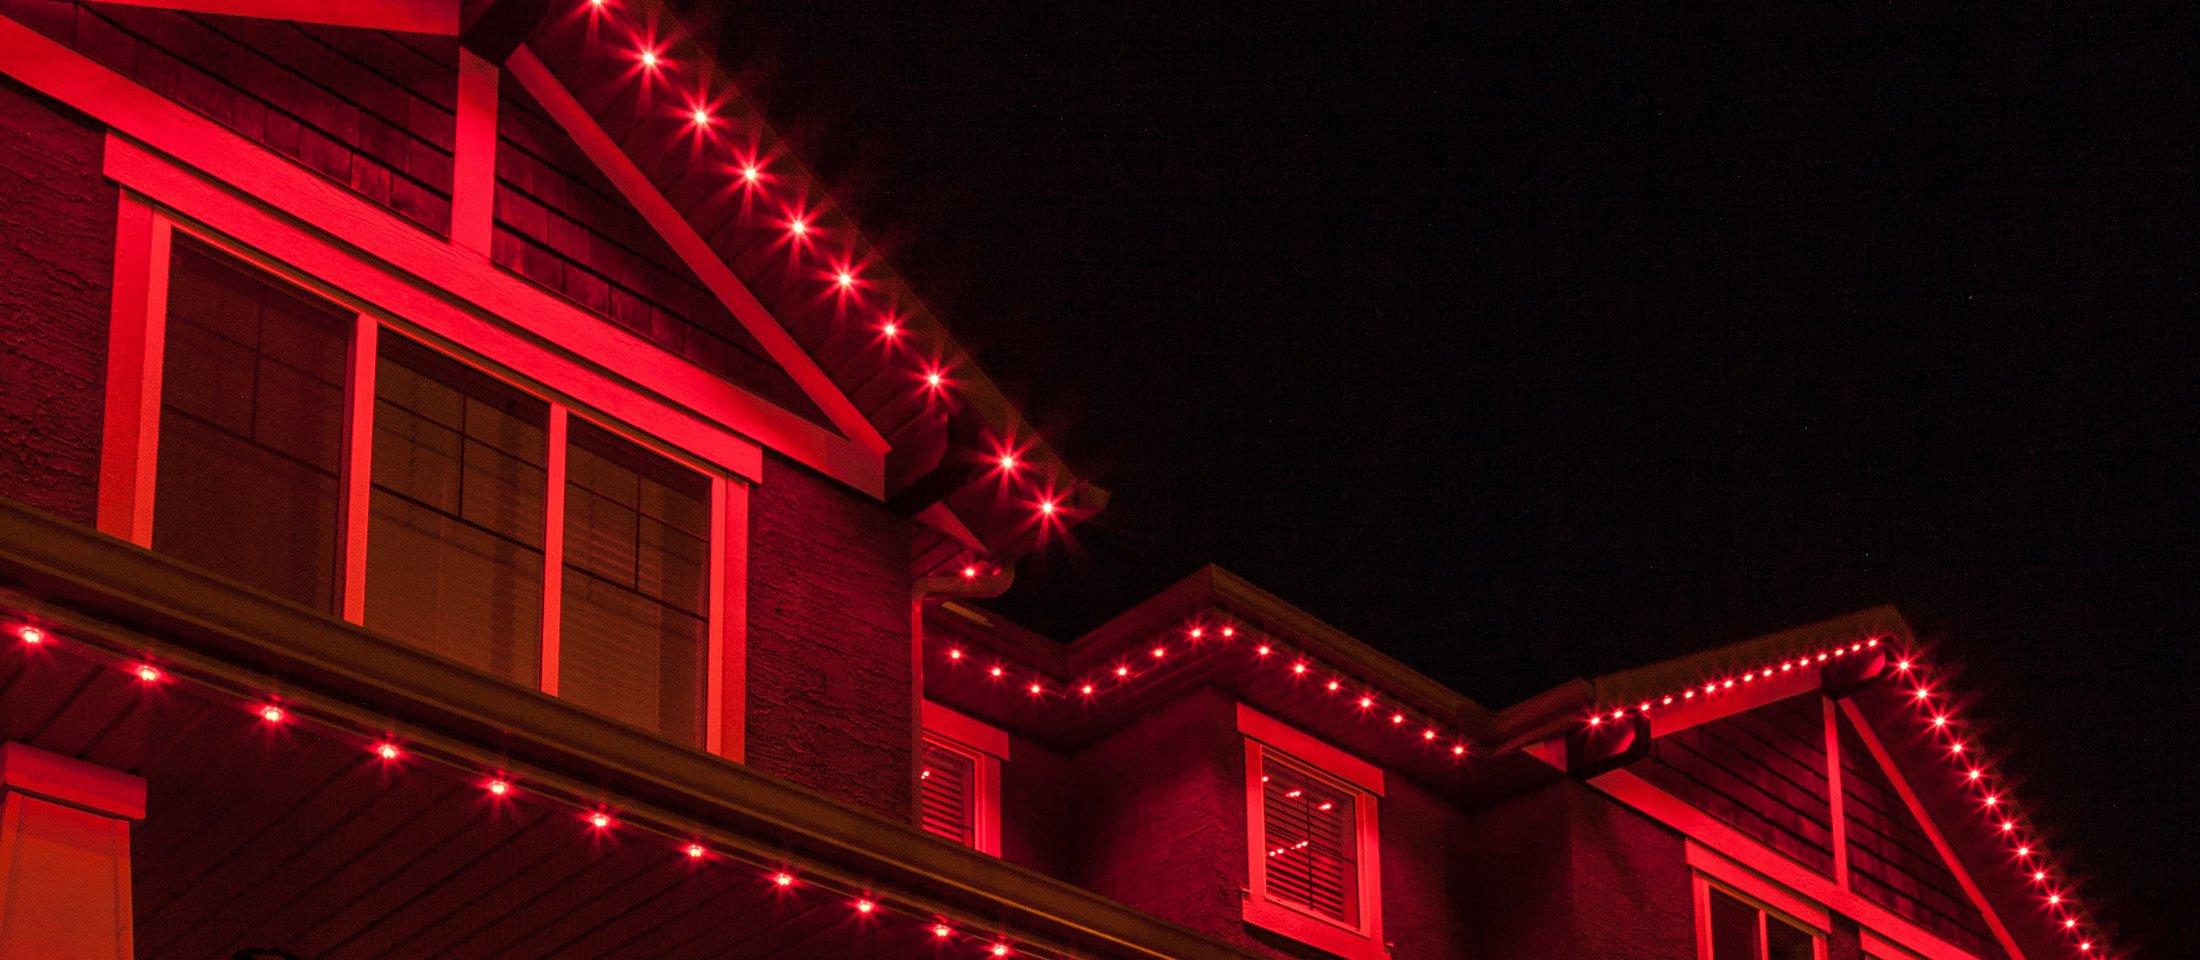 Home | Gemstone Lights- Smart Outdoor Lighting | Seasonal